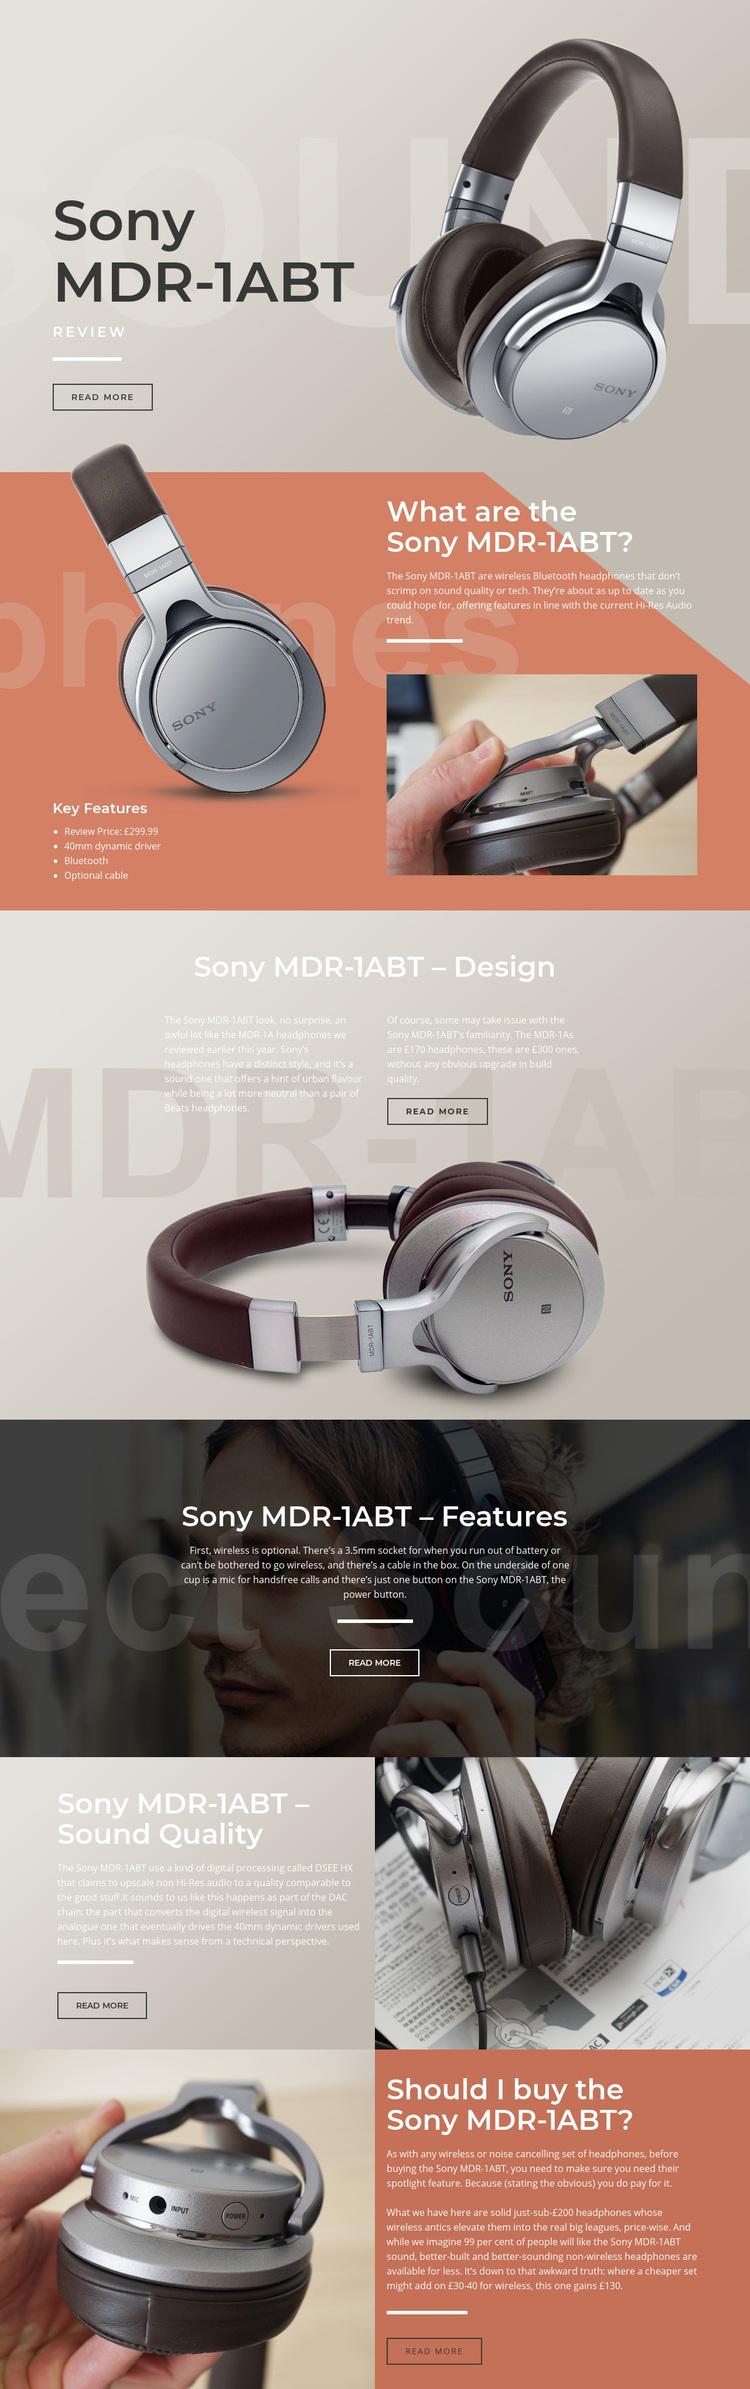 Listening your favorite music Web Page Designer